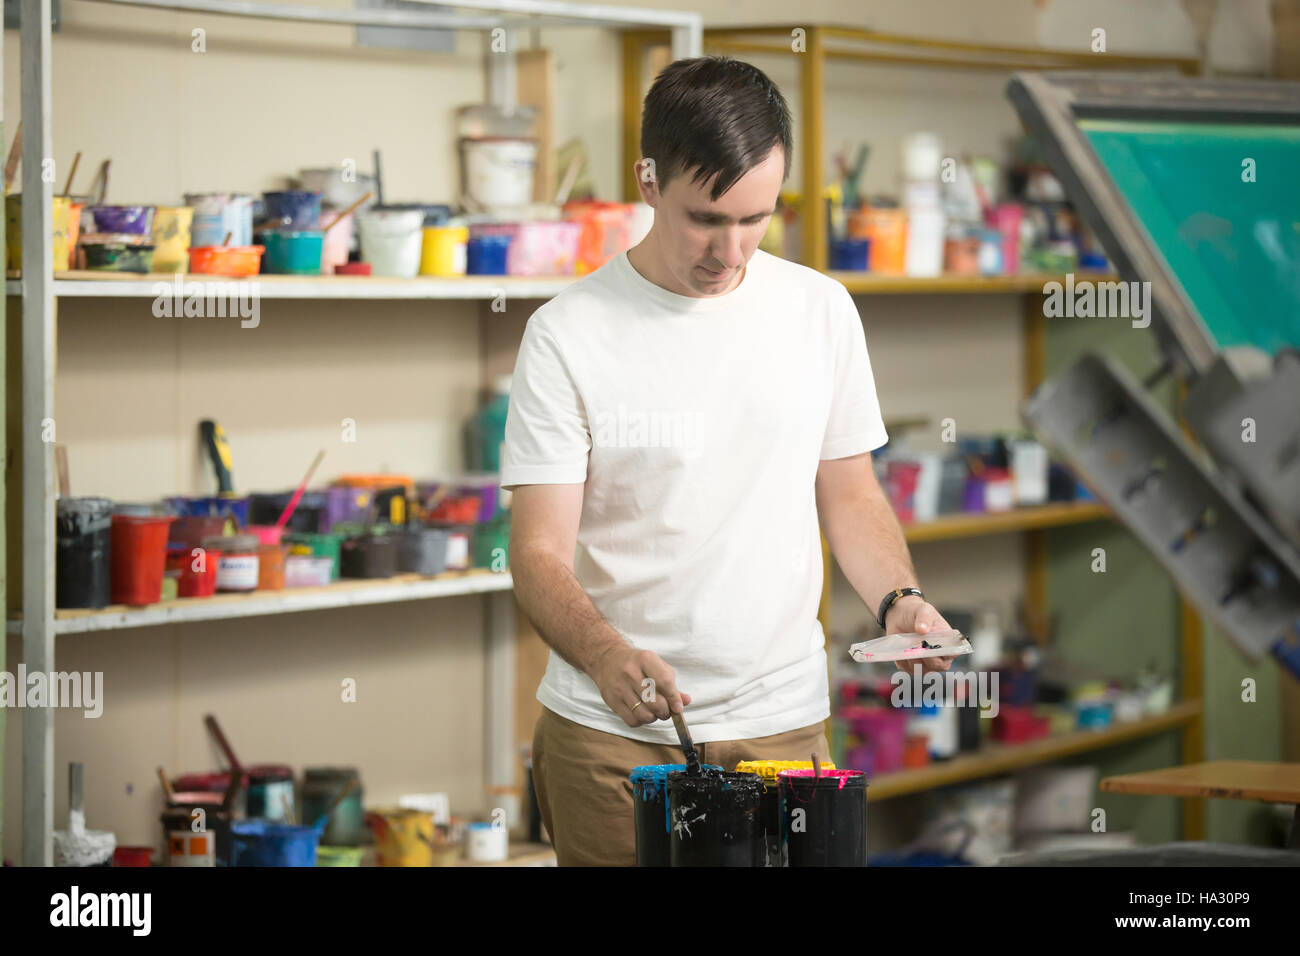 Young man combining CMYK - Stock Image